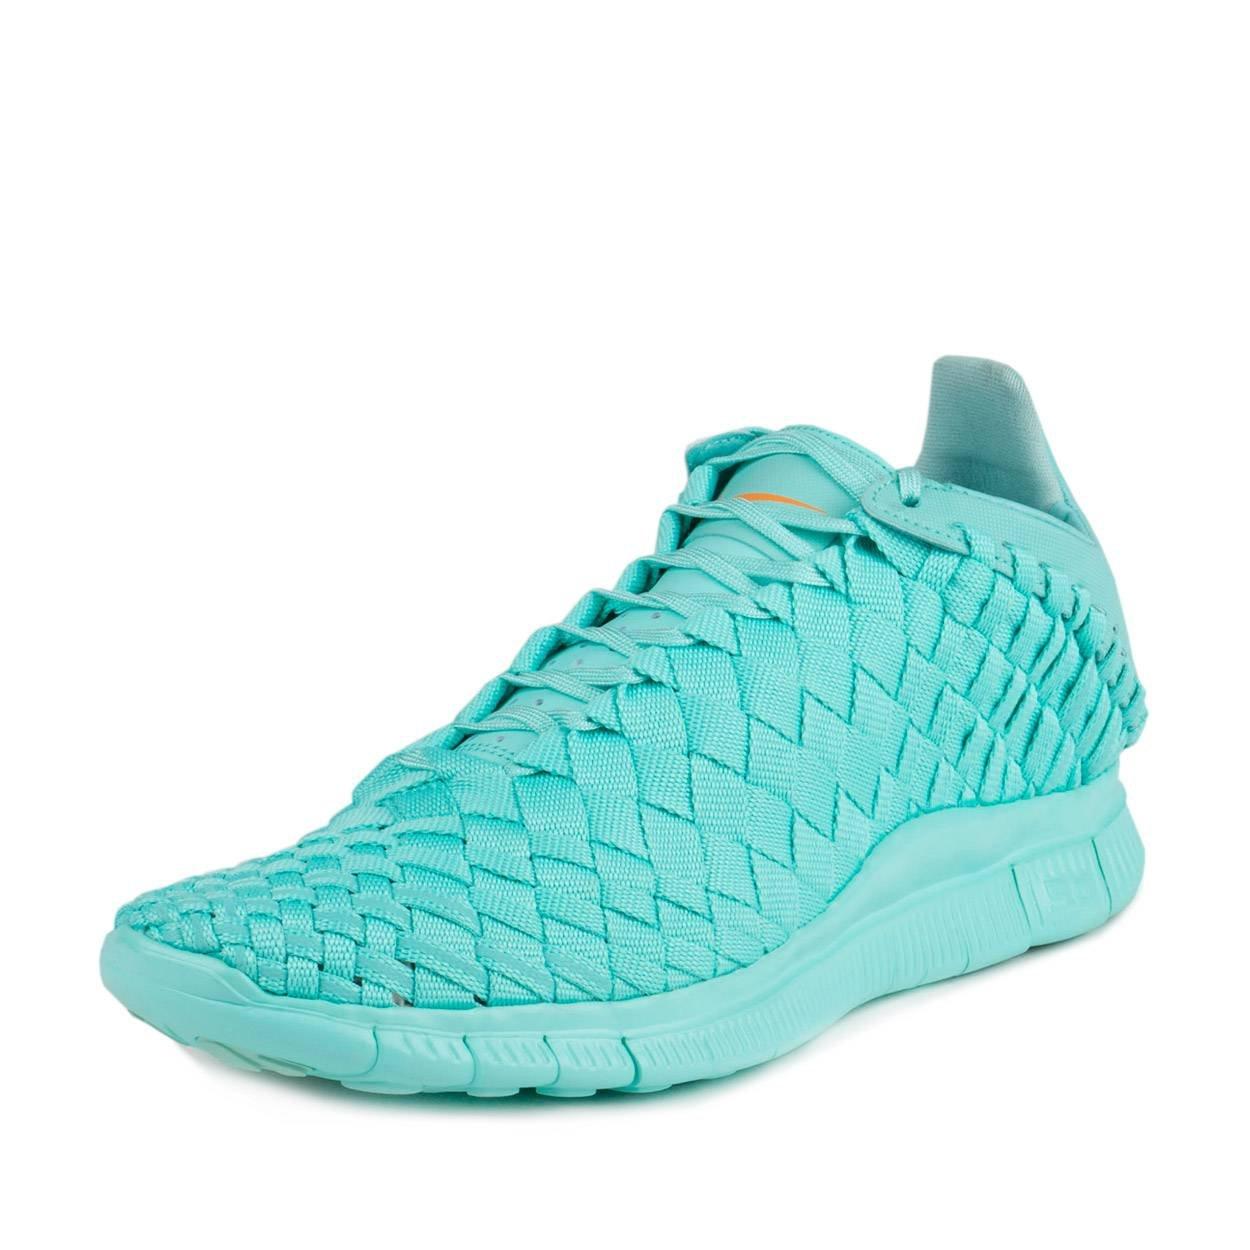 28f8682f95bb Nike Free Inneva Woven Tech SP - Light Aqua Light Aqua-Kumquat Trainer   Amazon.co.uk  Shoes   Bags